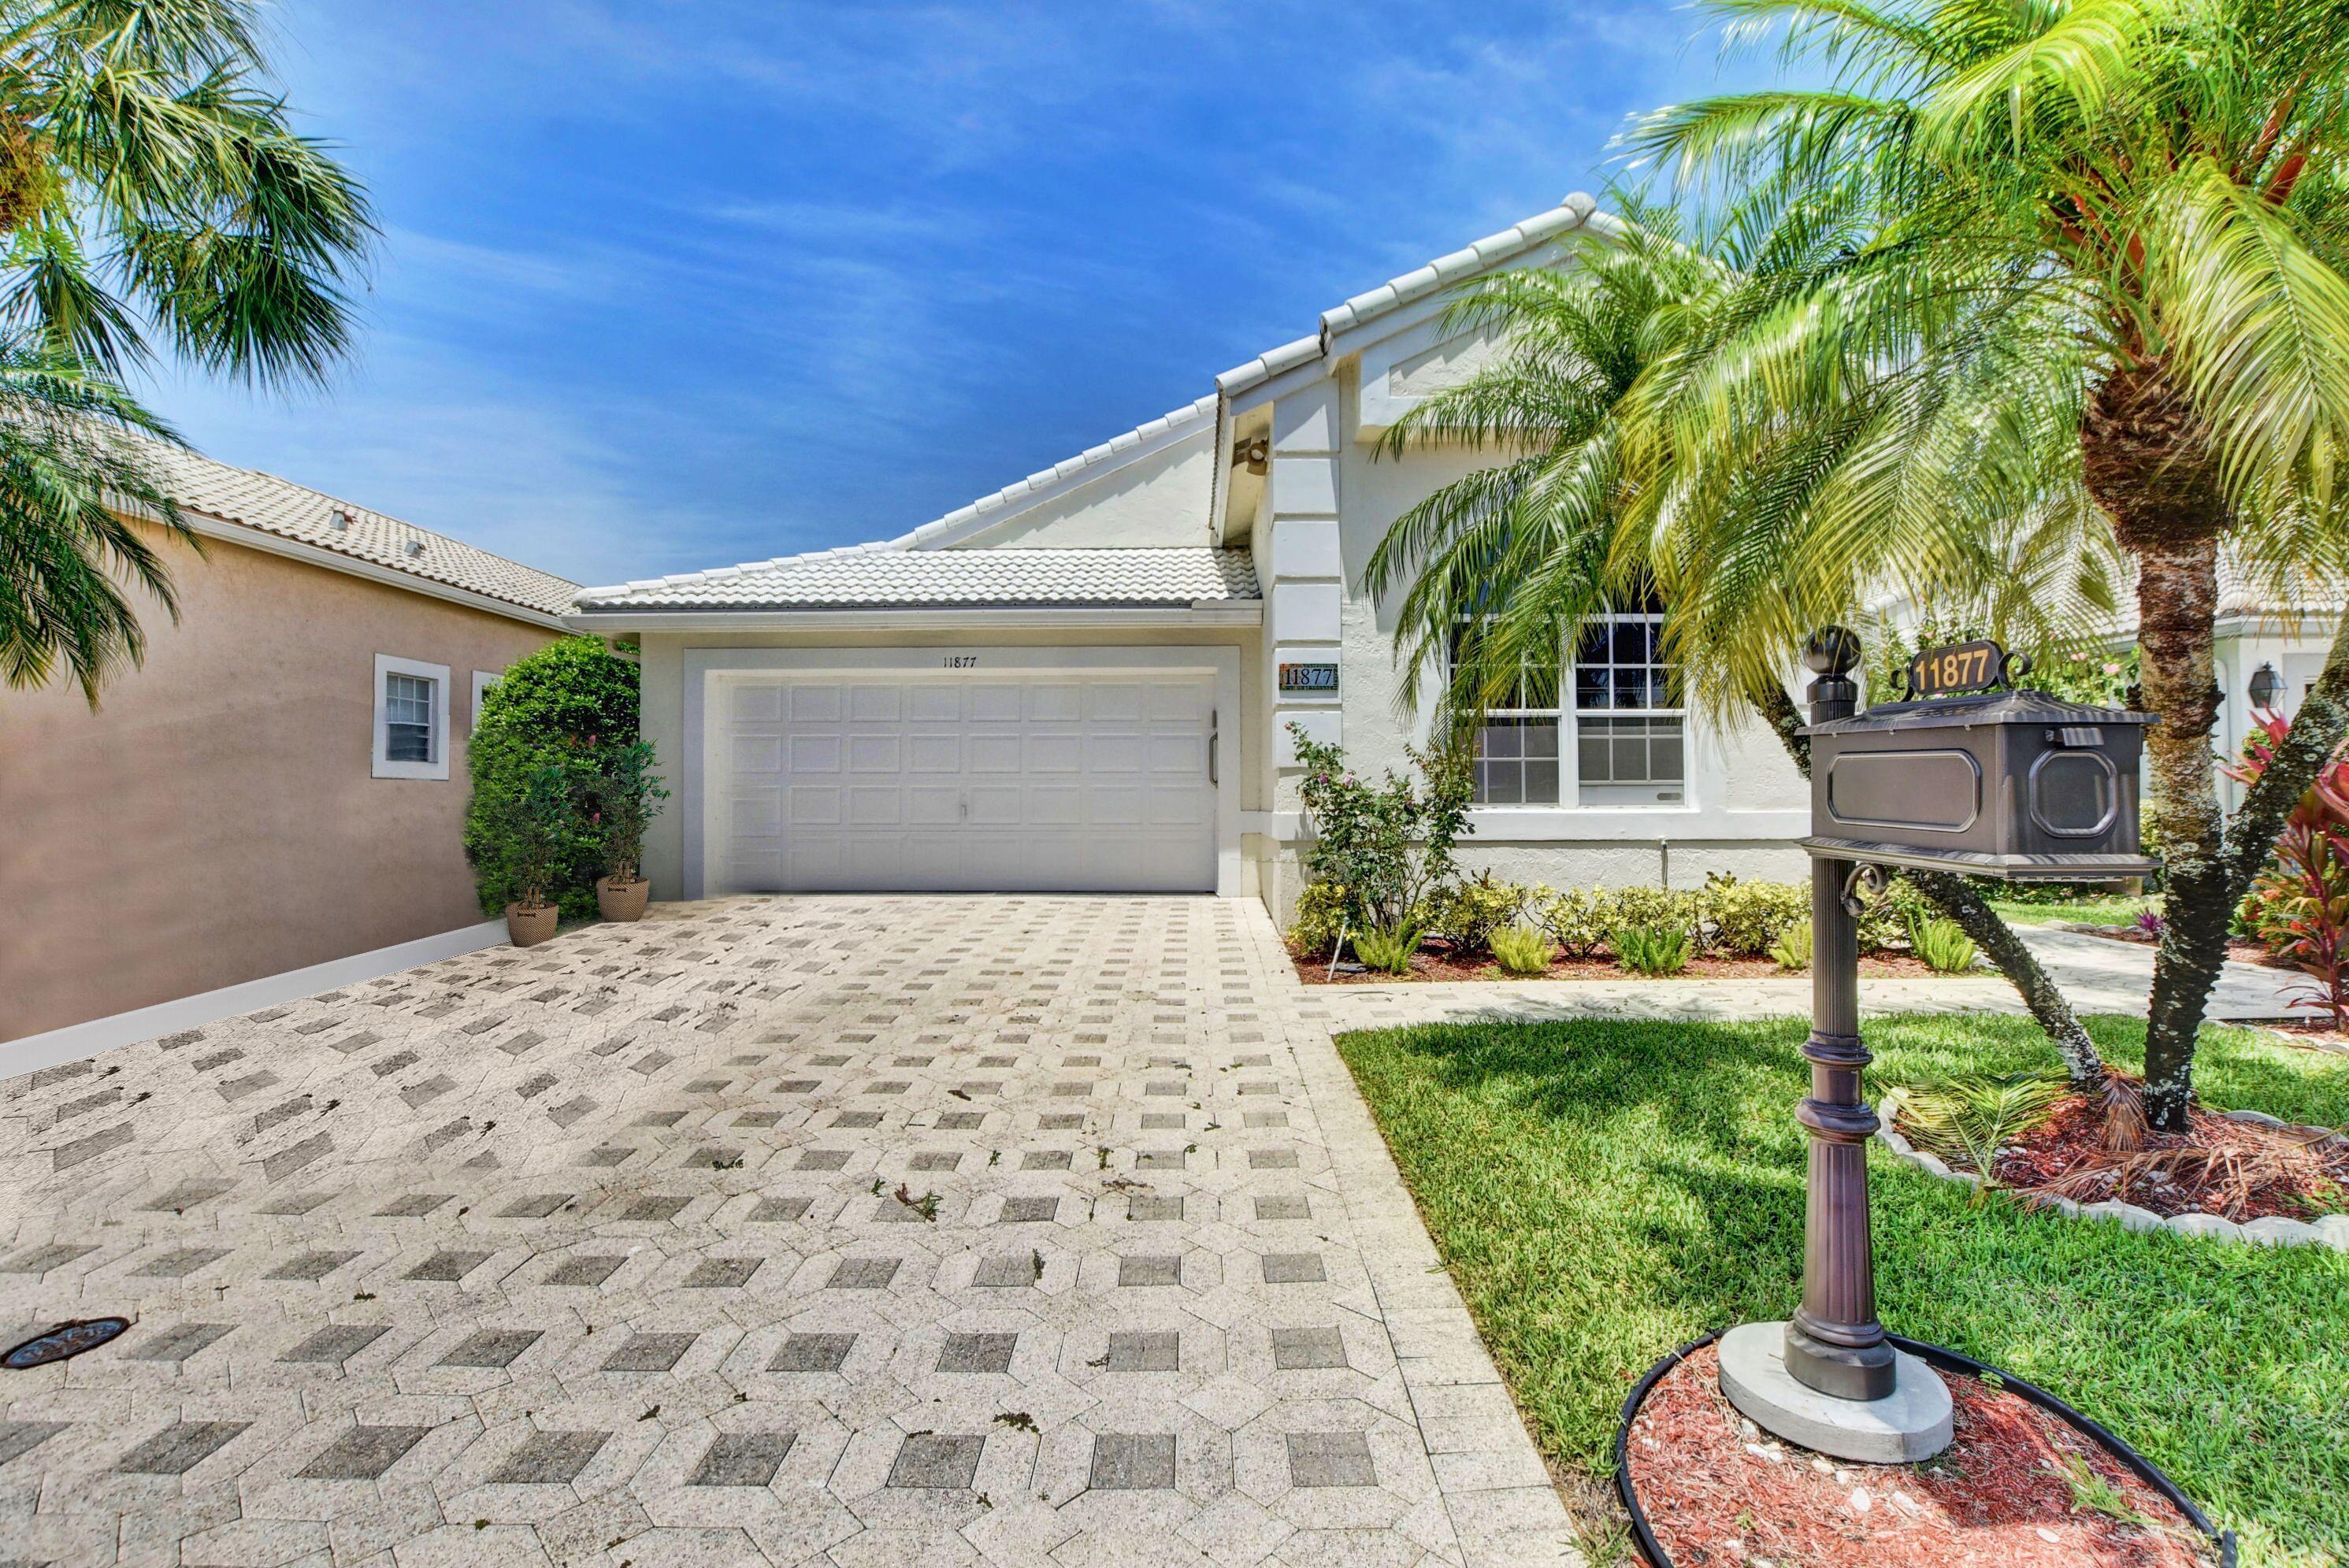 11877 Fountainside Circle  Boynton Beach FL 33437